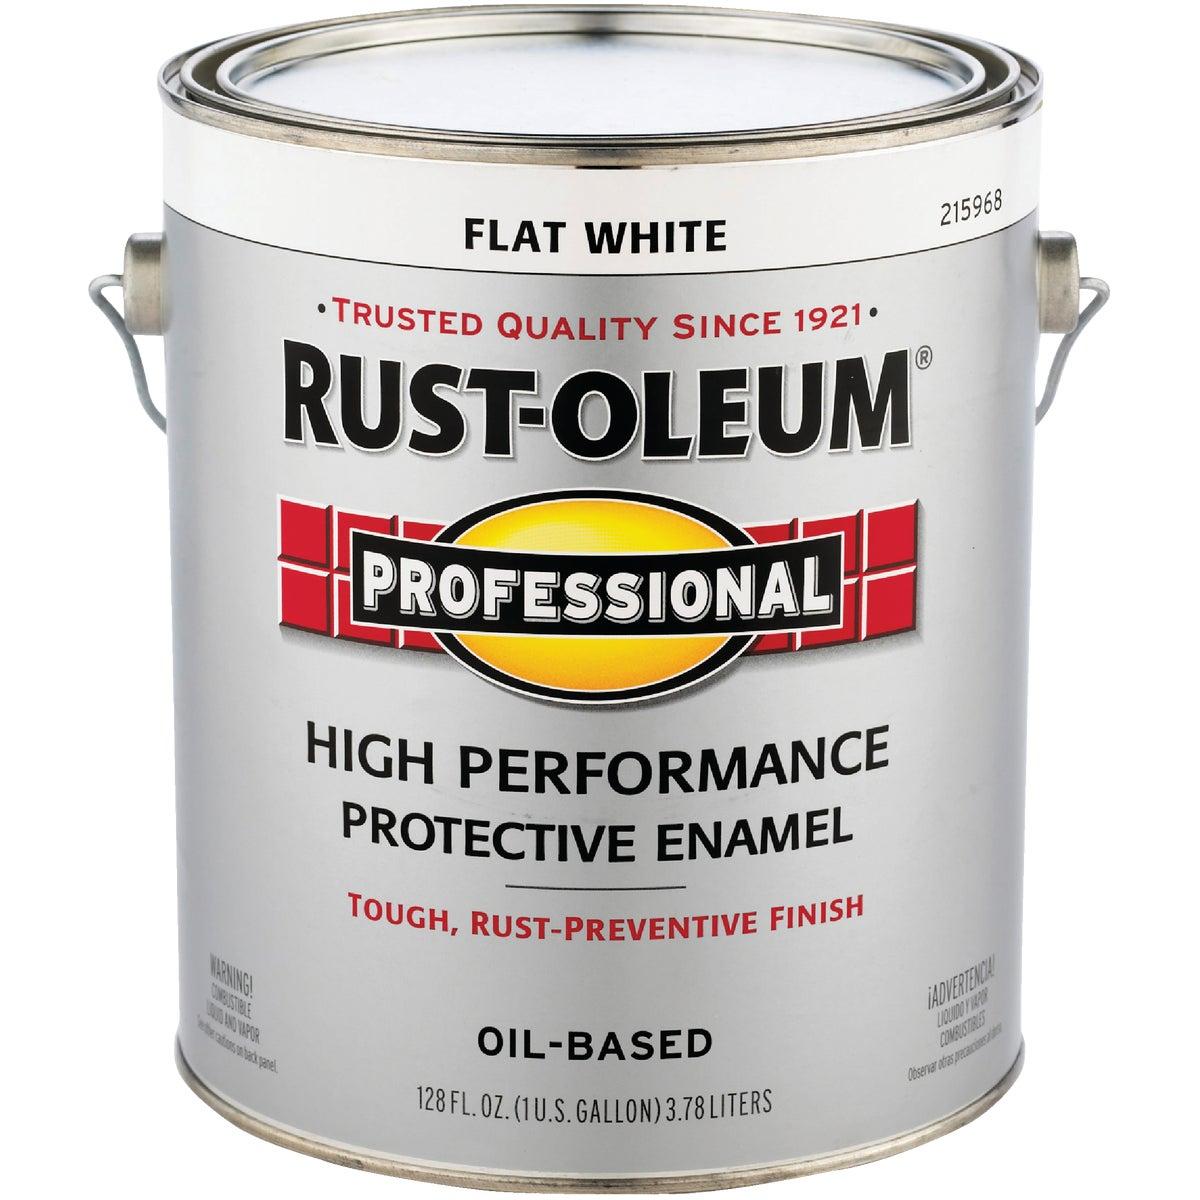 Rust Oleum FLAT WHITE ENAMEL 7790-402